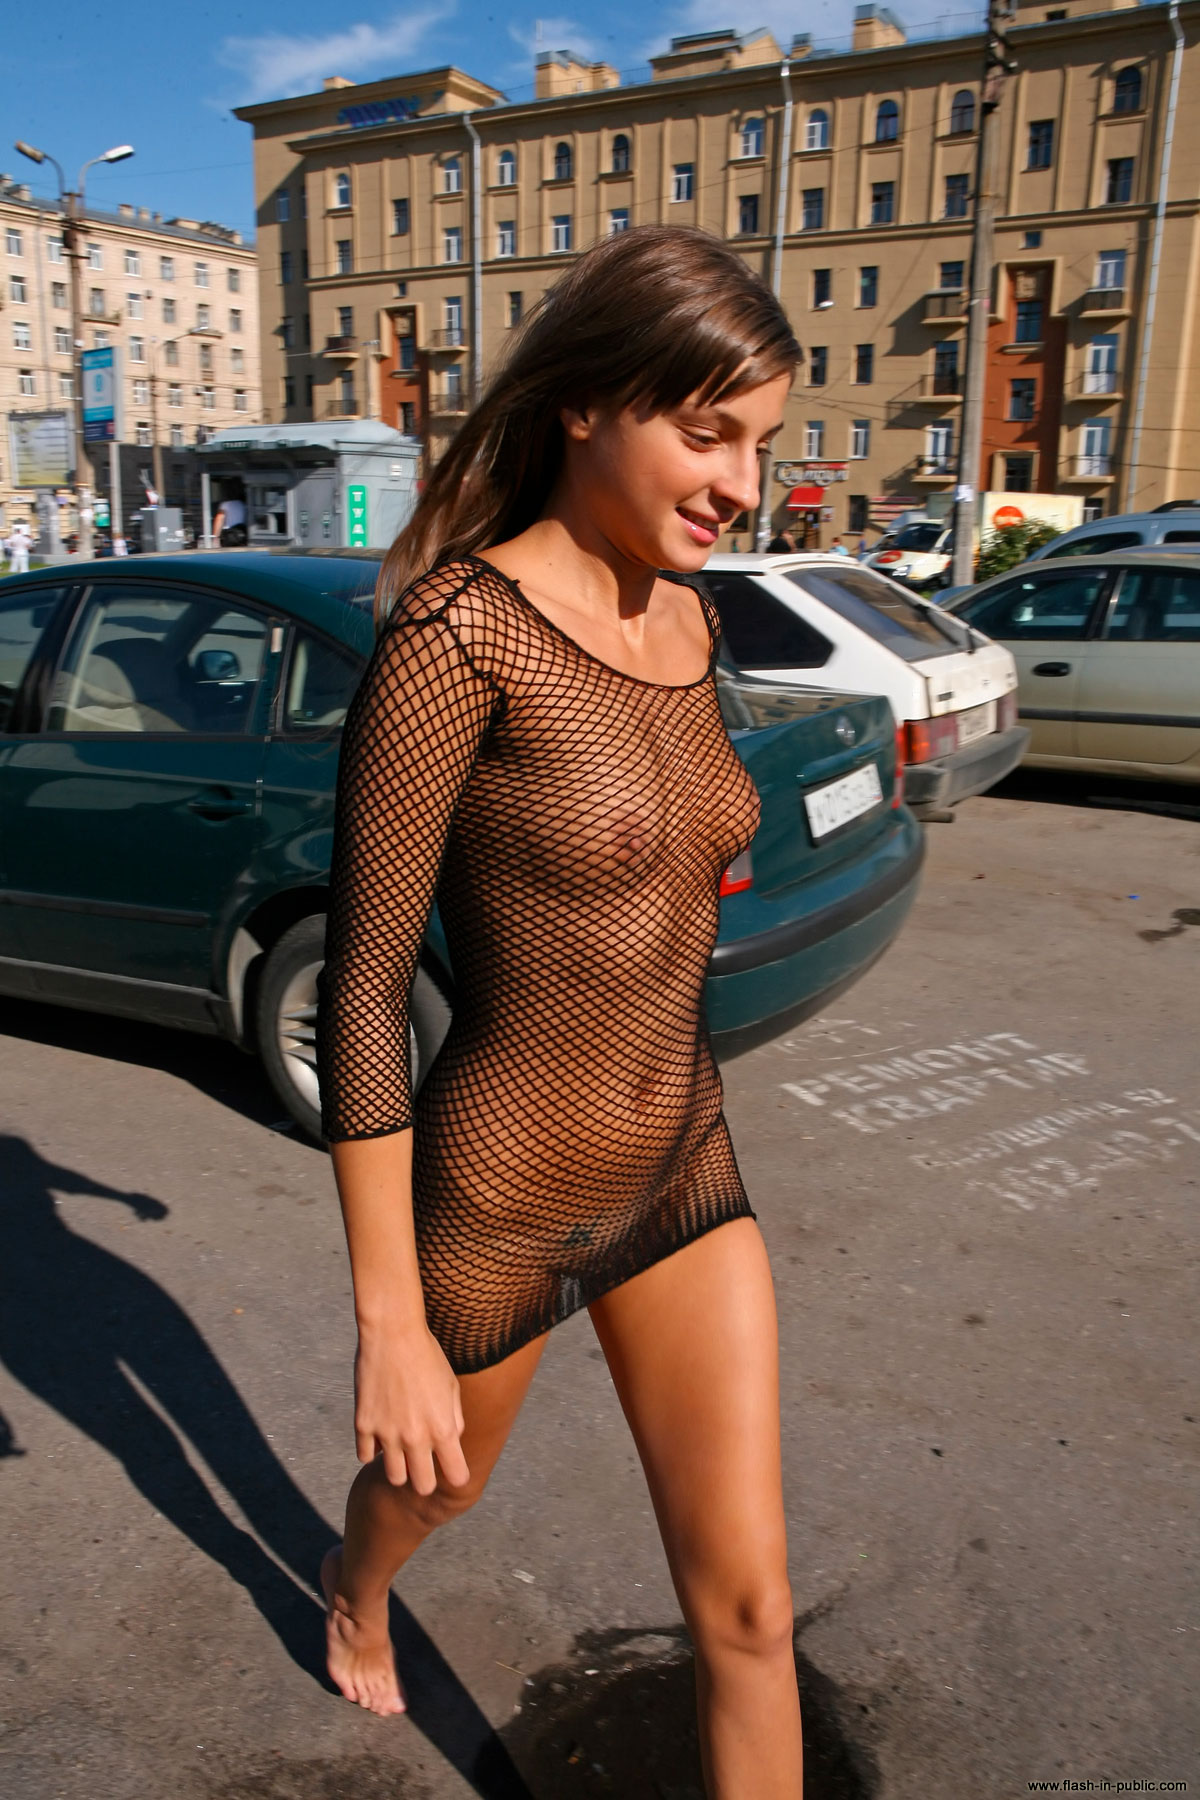 melena-r-nude-fishnet-flash-in-public-27